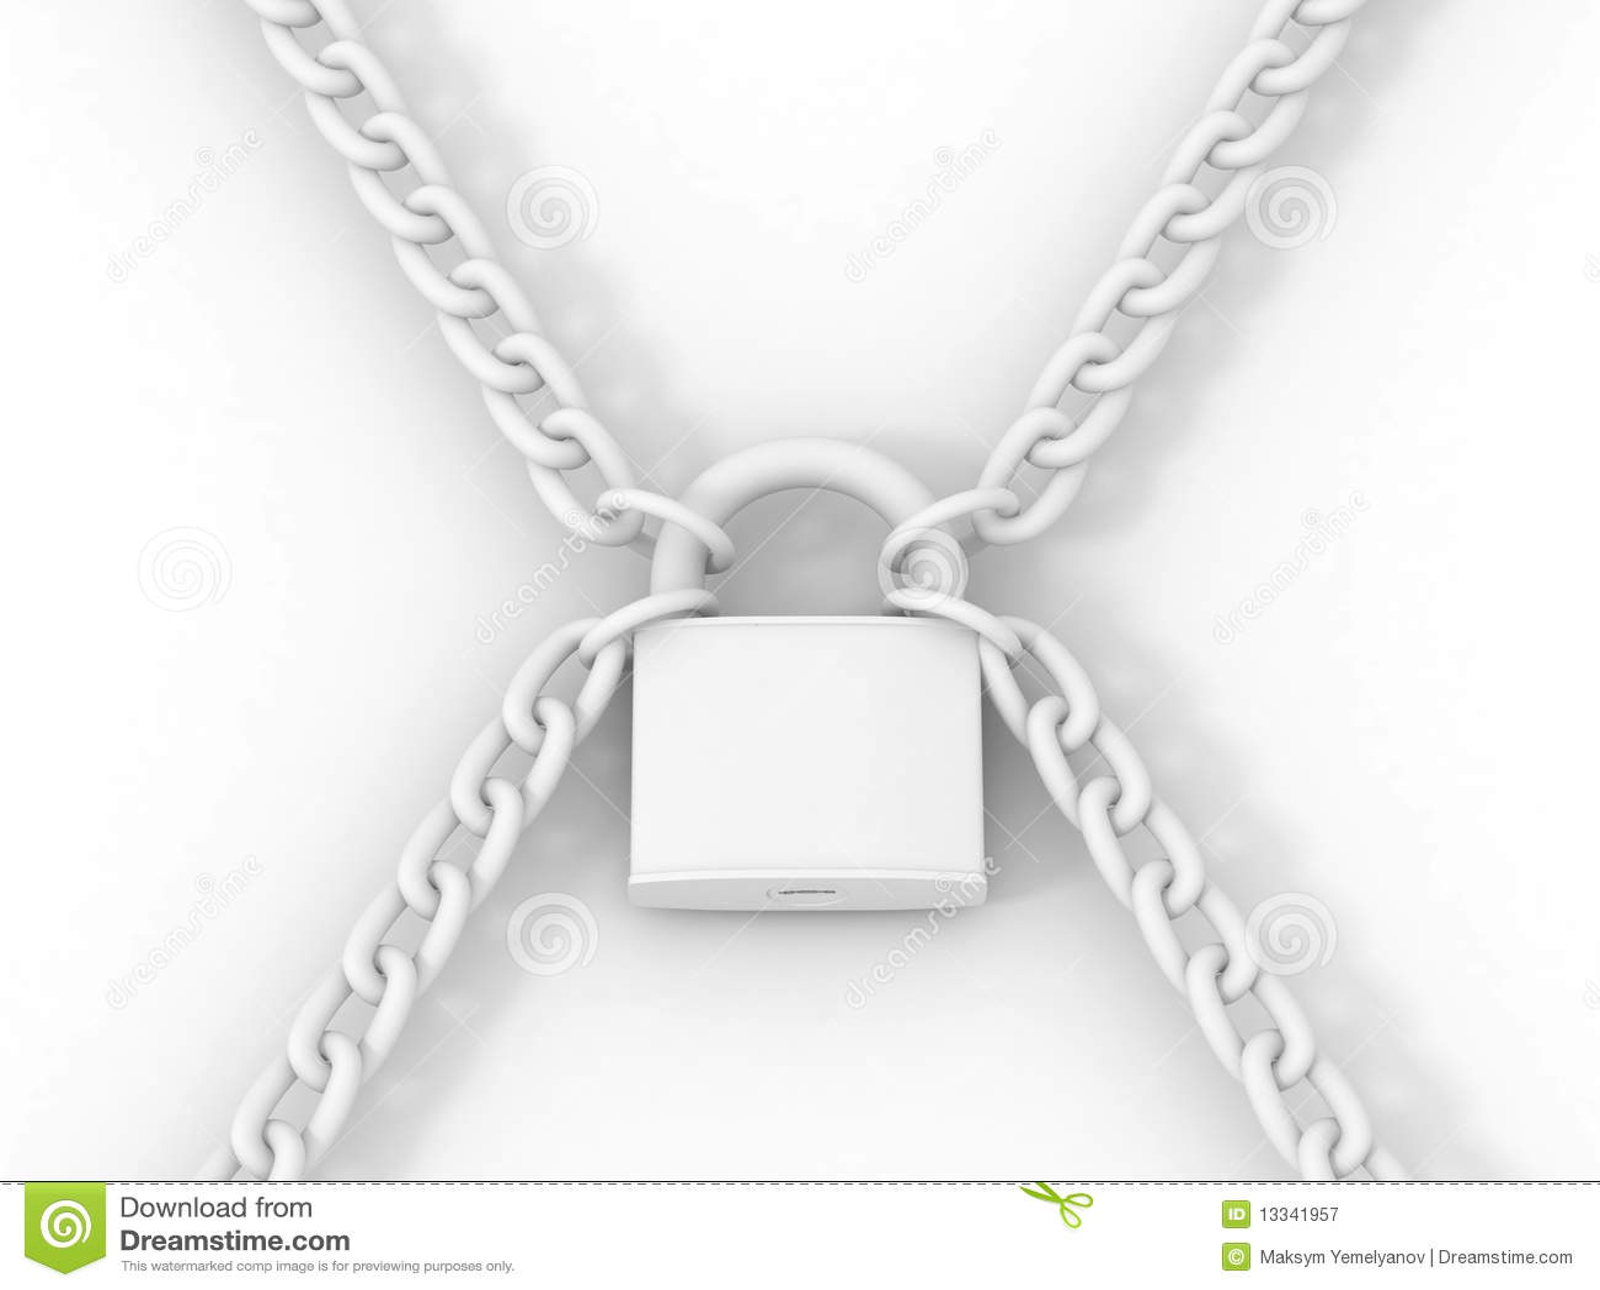 3d图片白色锁定锁上社区.链子a图片背景小屋图片